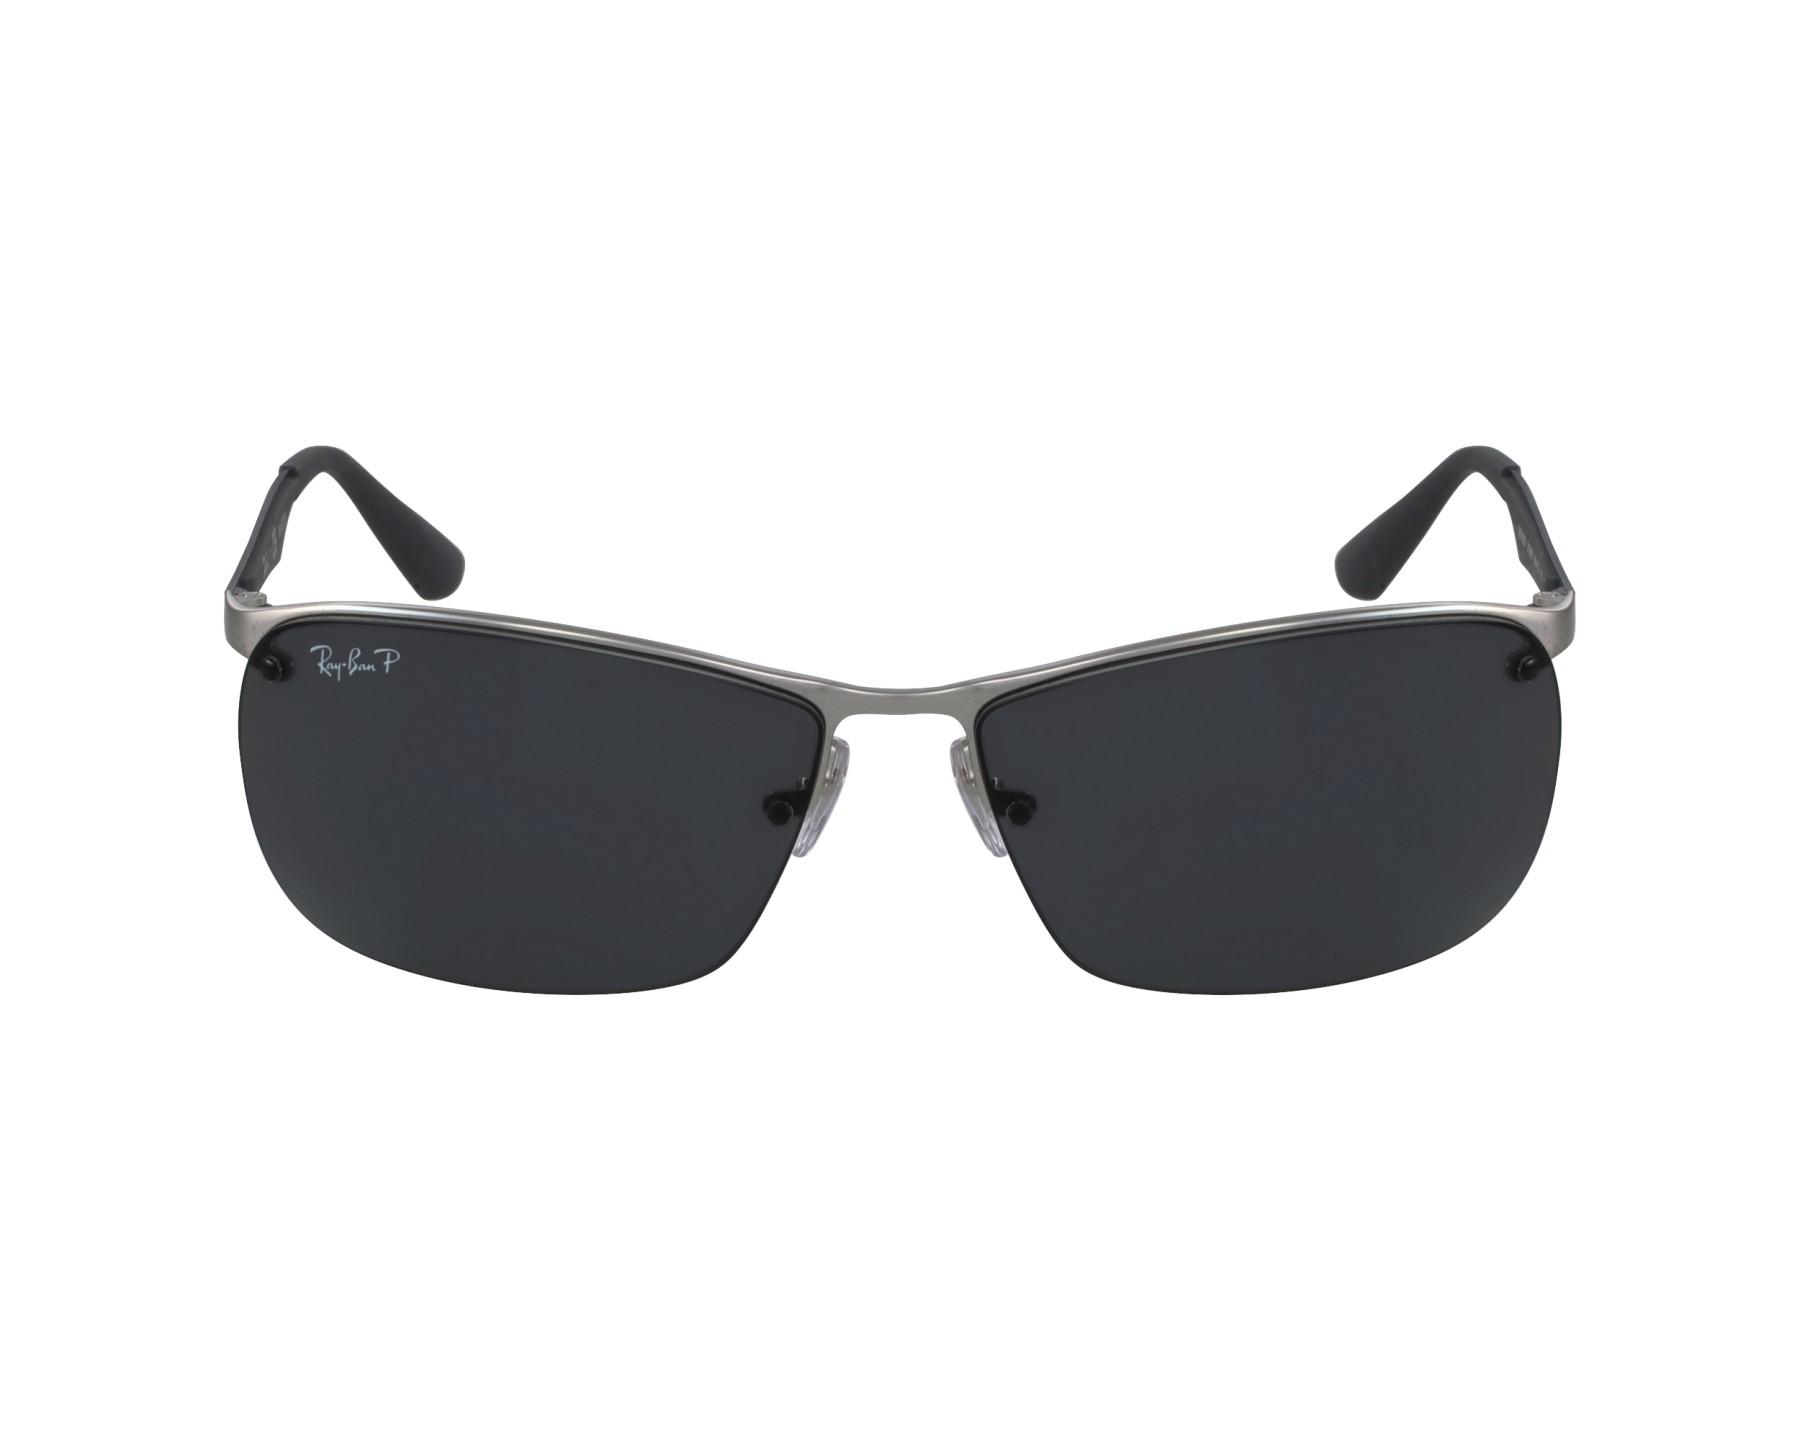 f1404d856d Ray Ban 3550 019 18. Sunglasses Ray-Ban RB ...